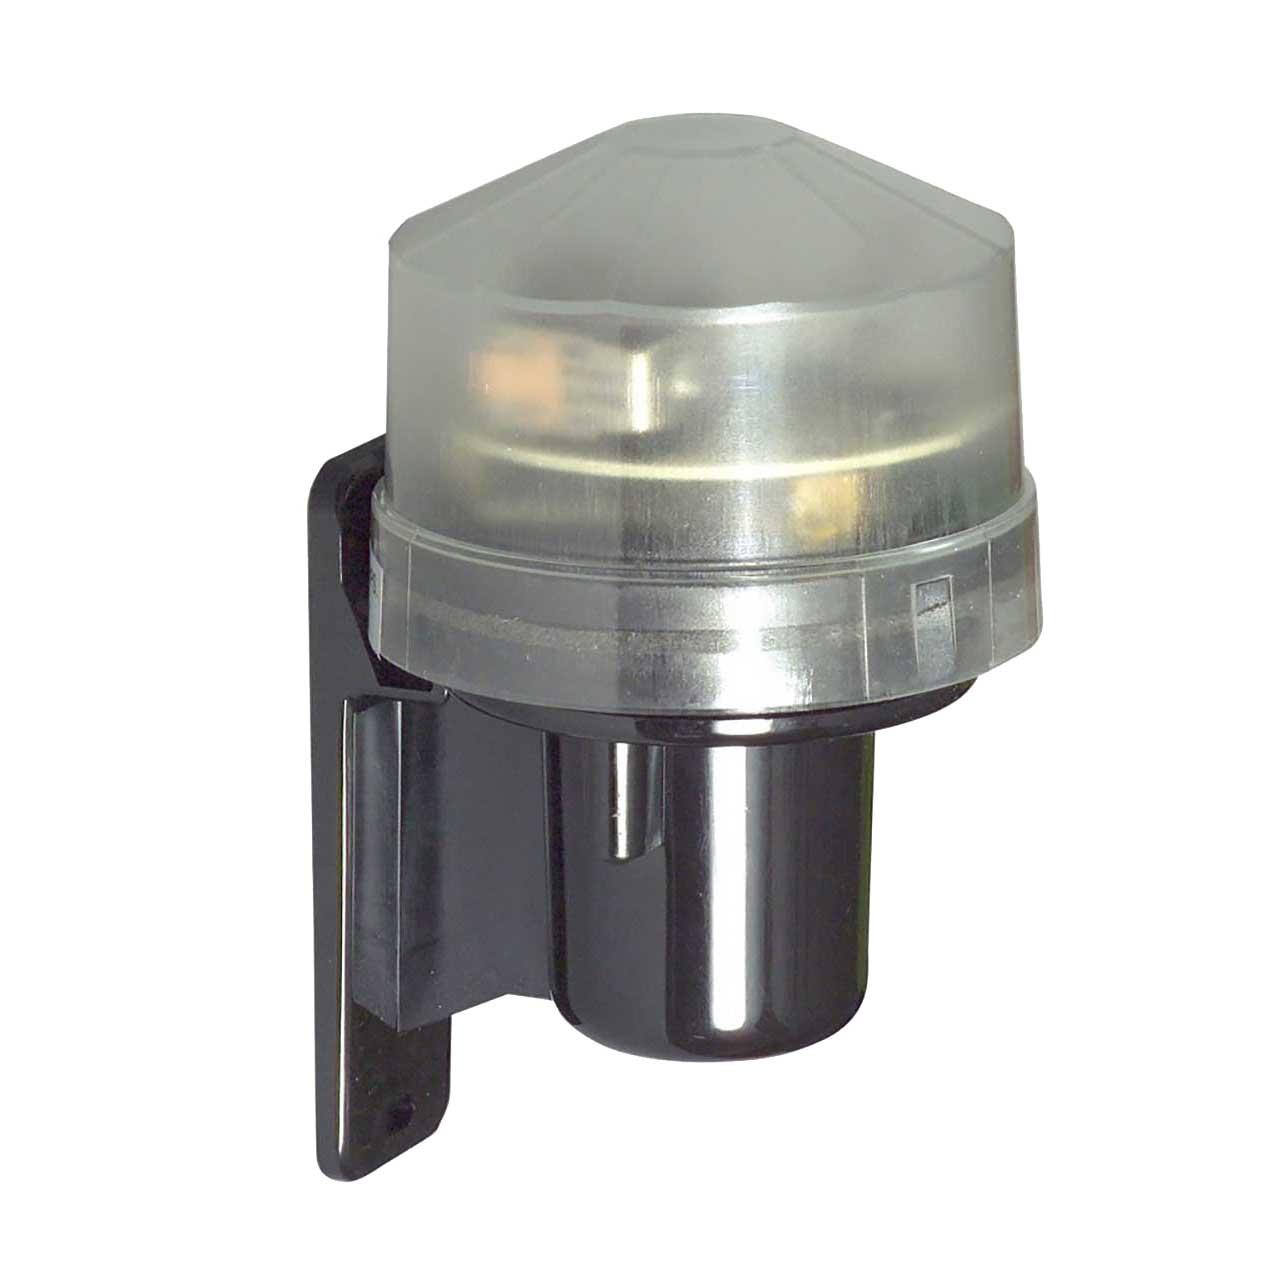 external photocell switch wiring diagram 7 way rv plug dusk till dawn sensor light photoelectric